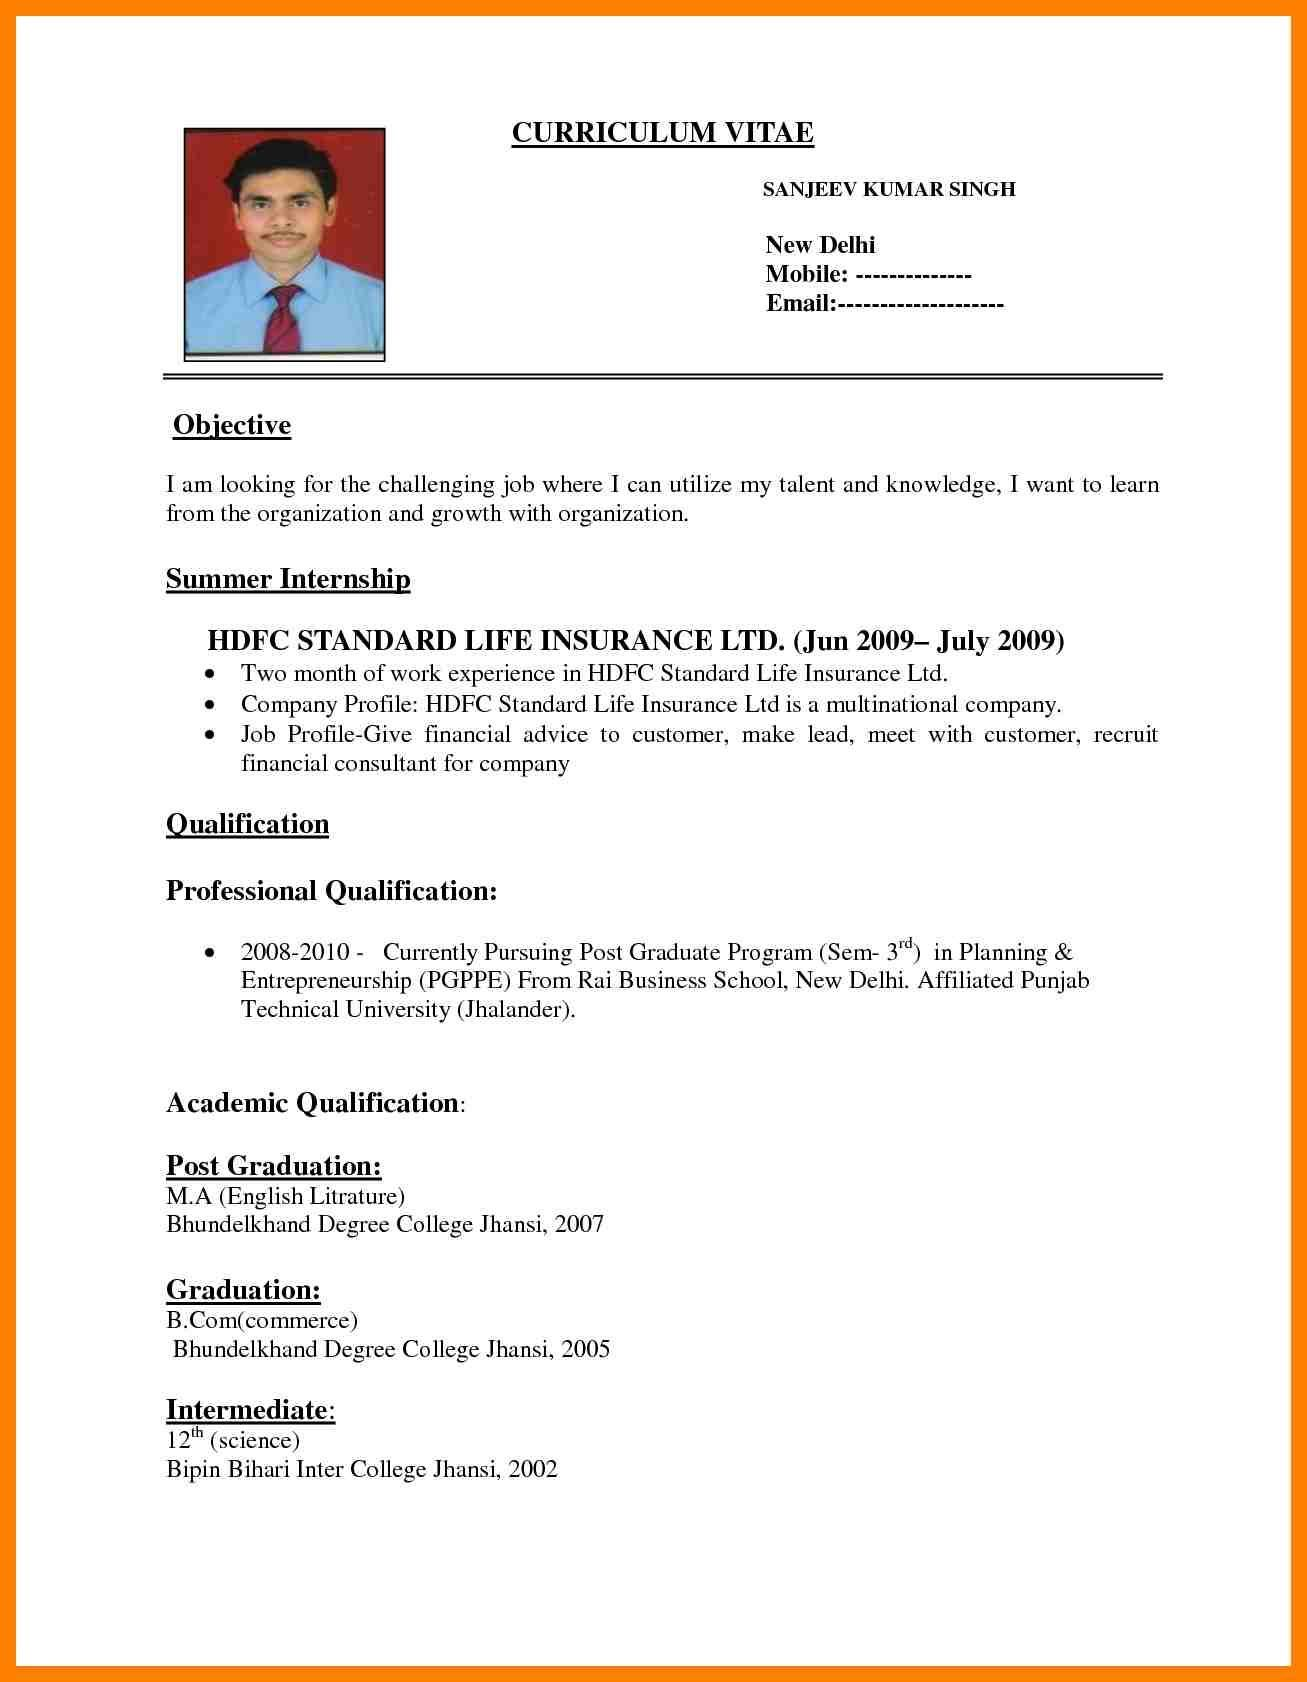 Resume Format India Resume Templatesformat india